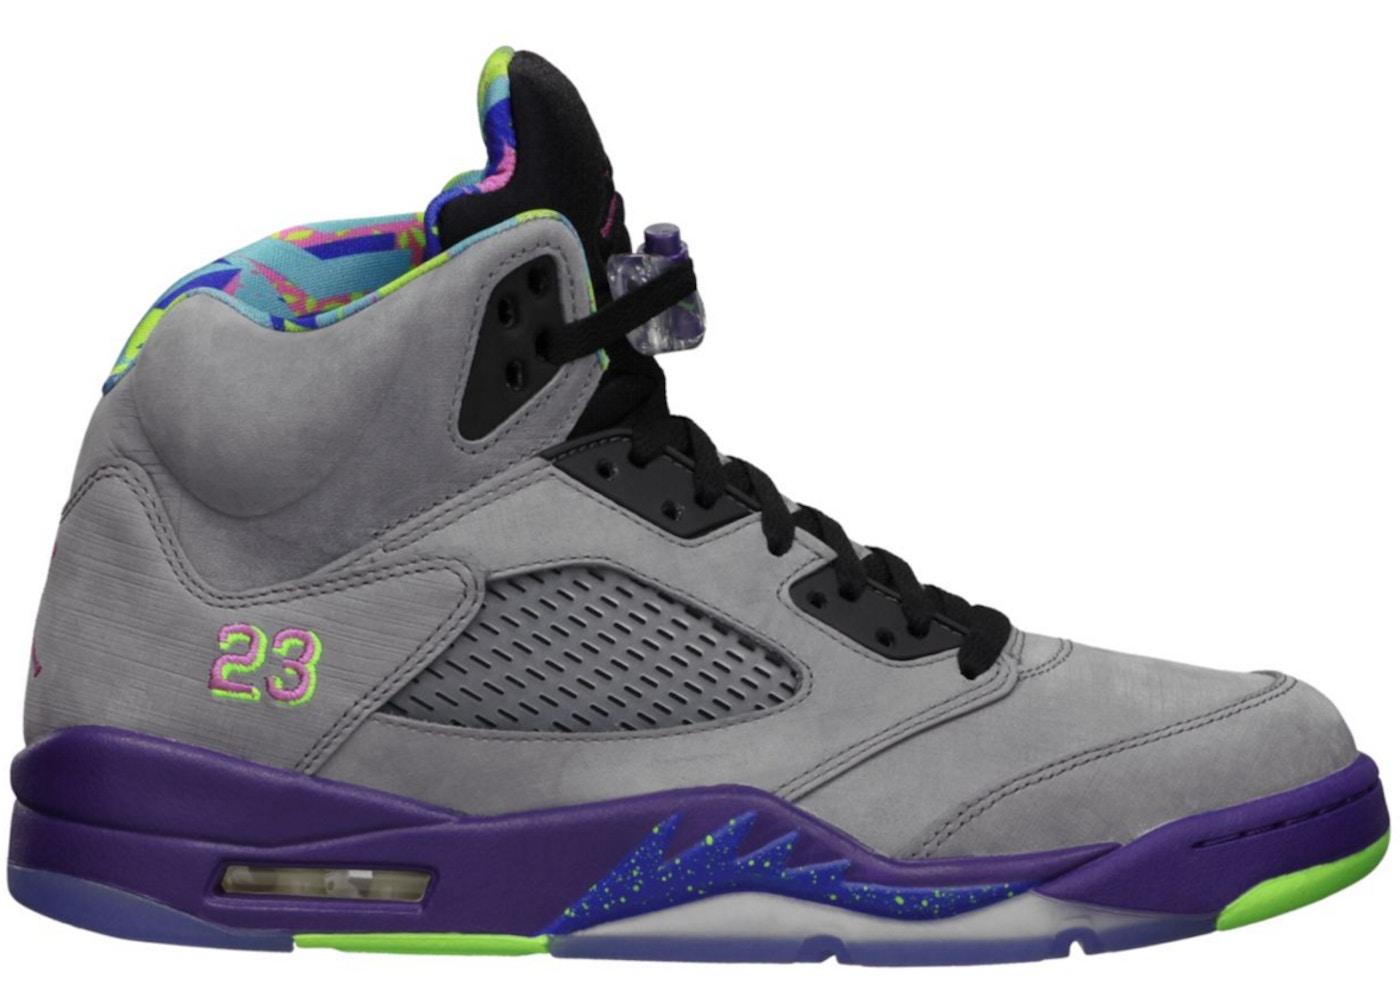 a914edde1f3 Sell. or Ask. Size: 5.5Y. View All Bids. Jordan 5 Retro Bel-Air ...